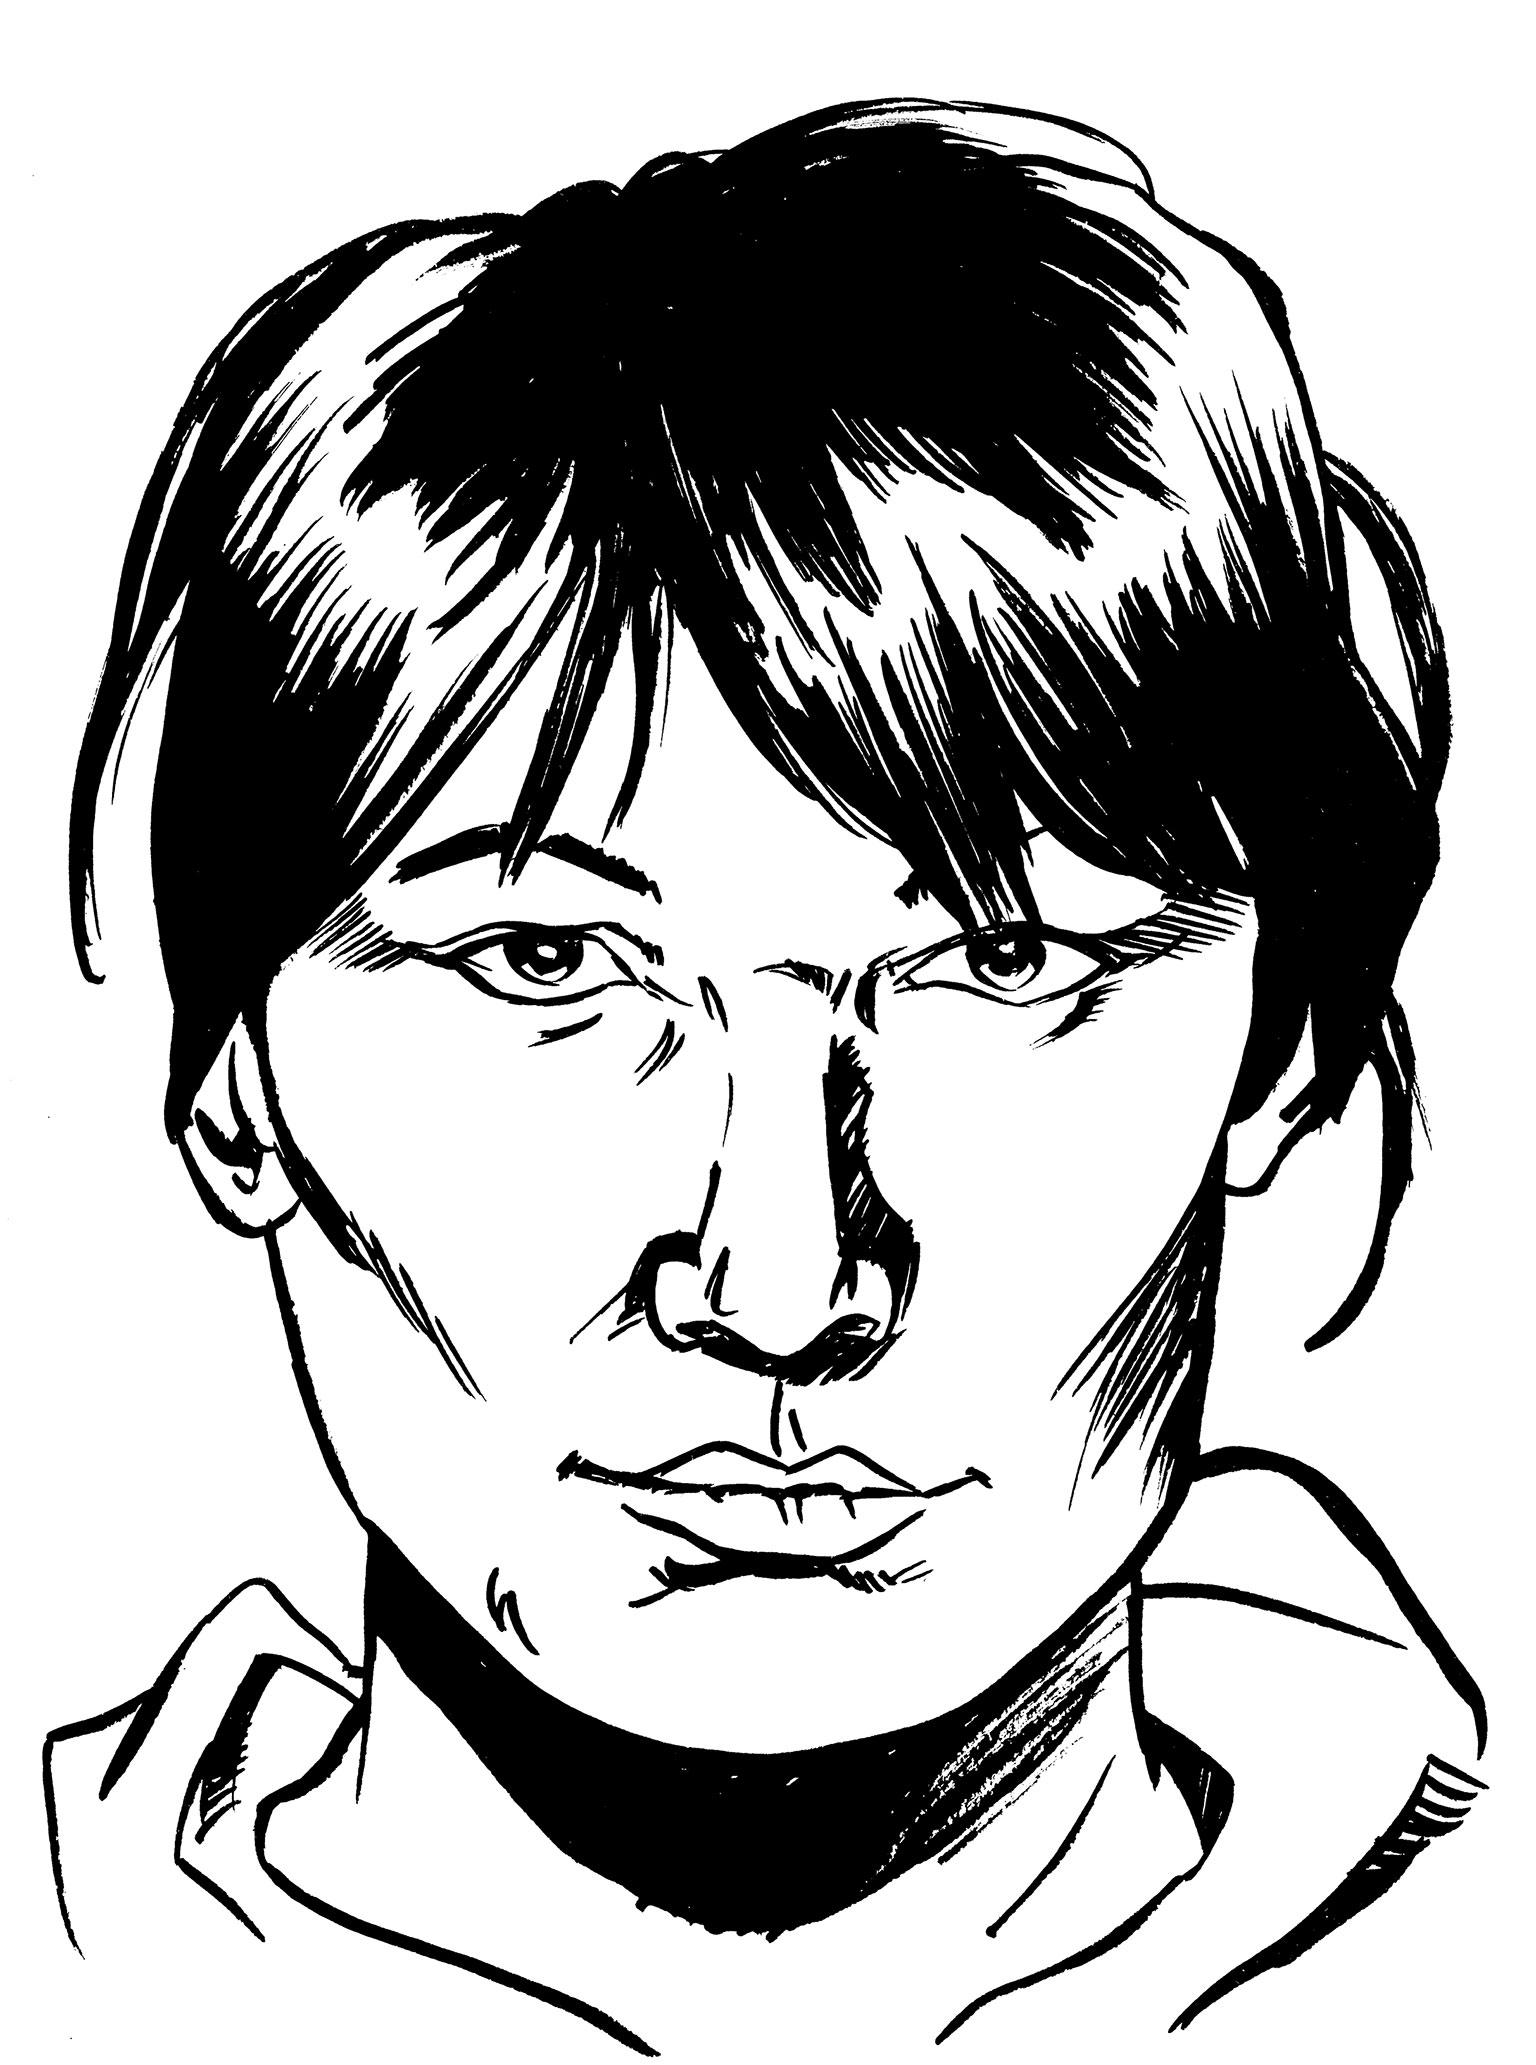 Illustration of Sharon Abraham by Evan Munday